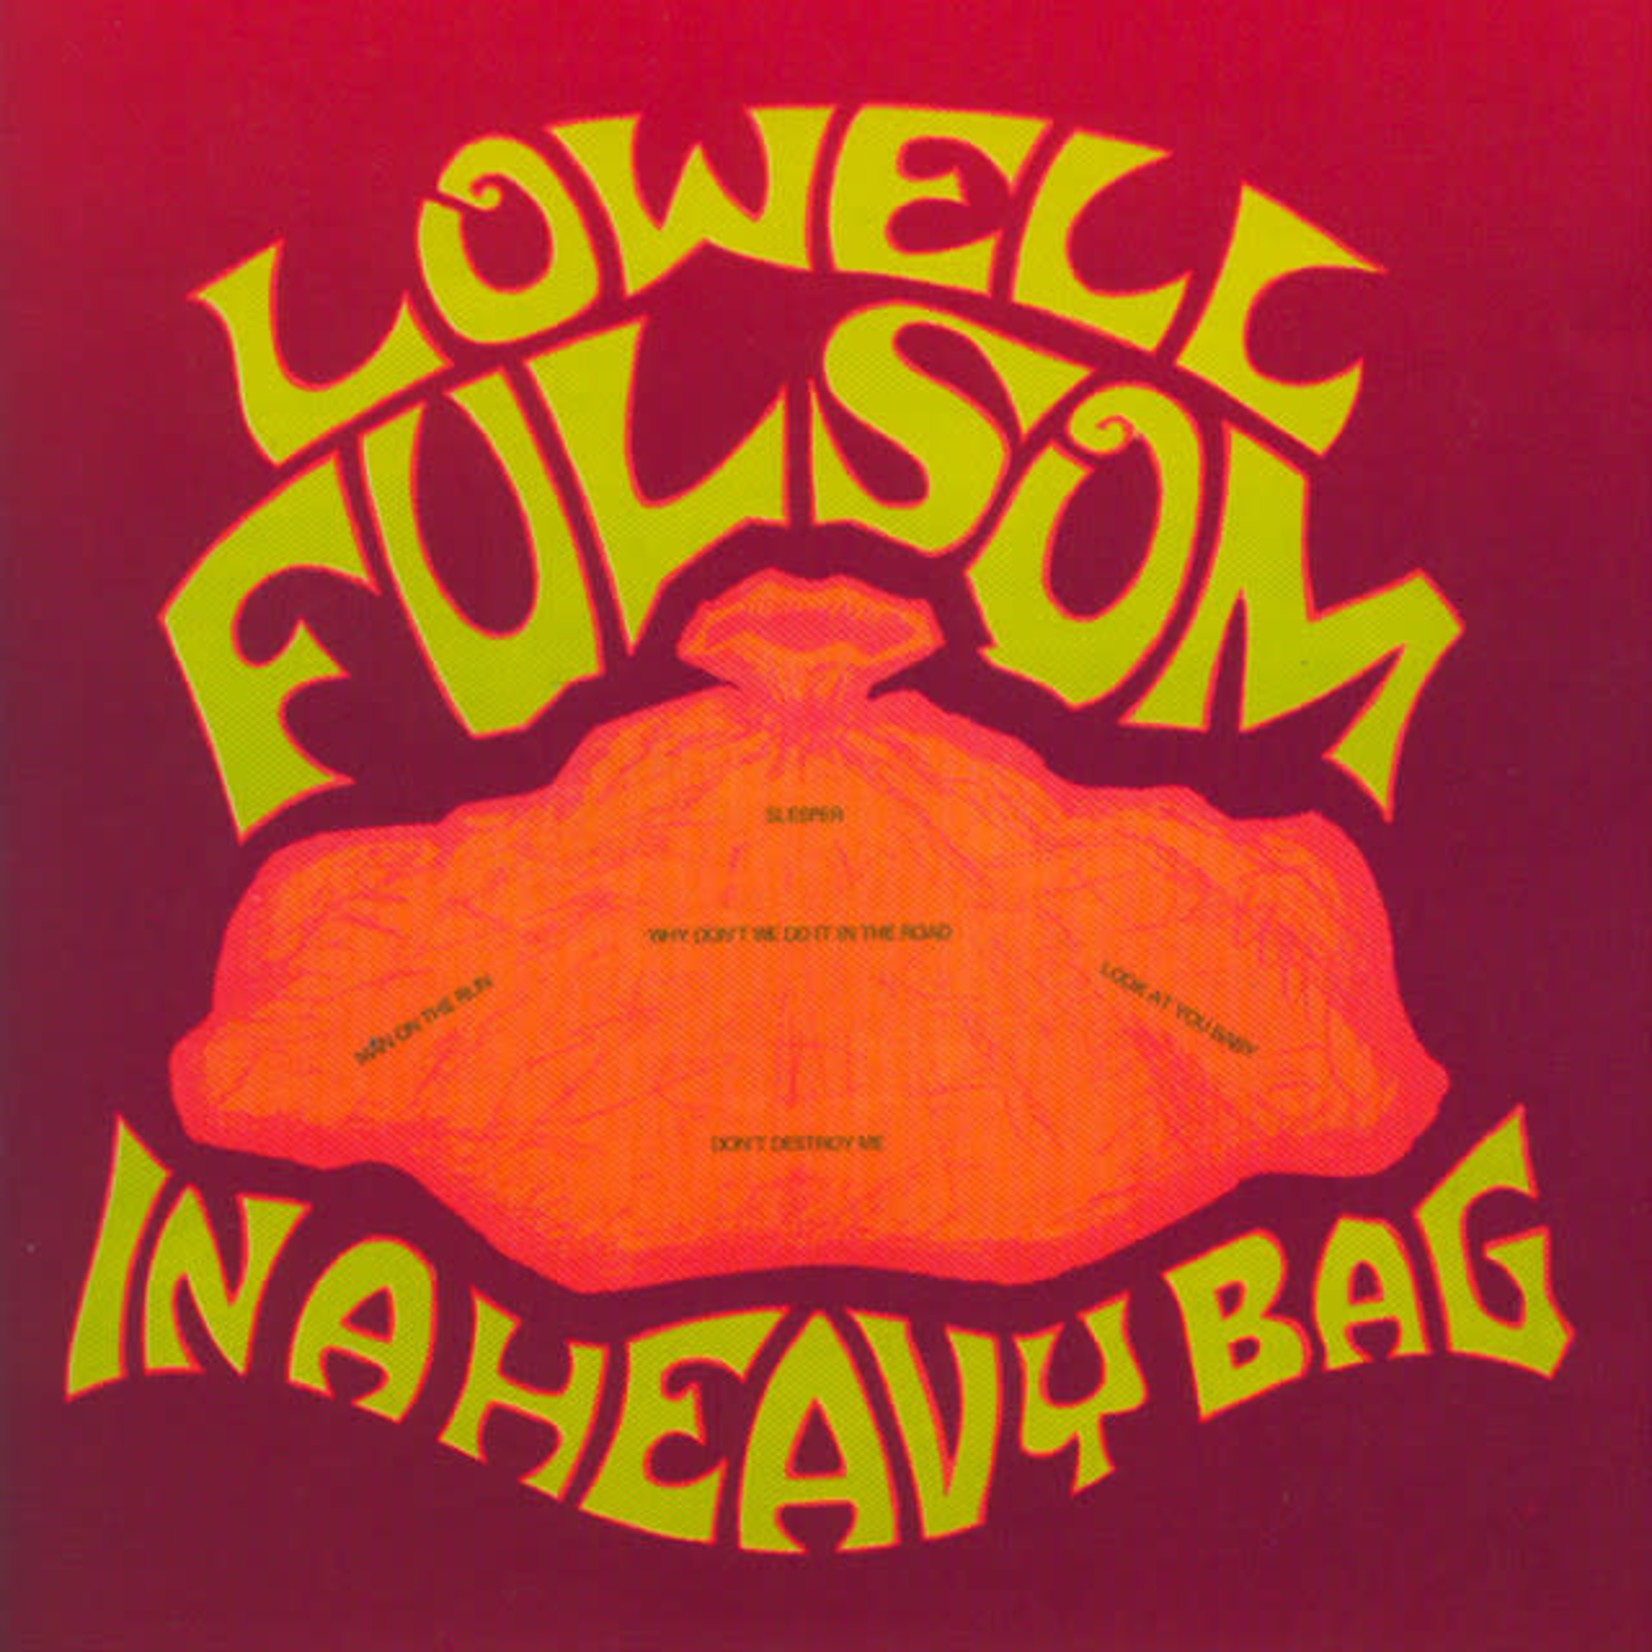 Vinyl Lowell Fulsom - In A Heavy Bag  Final Sale